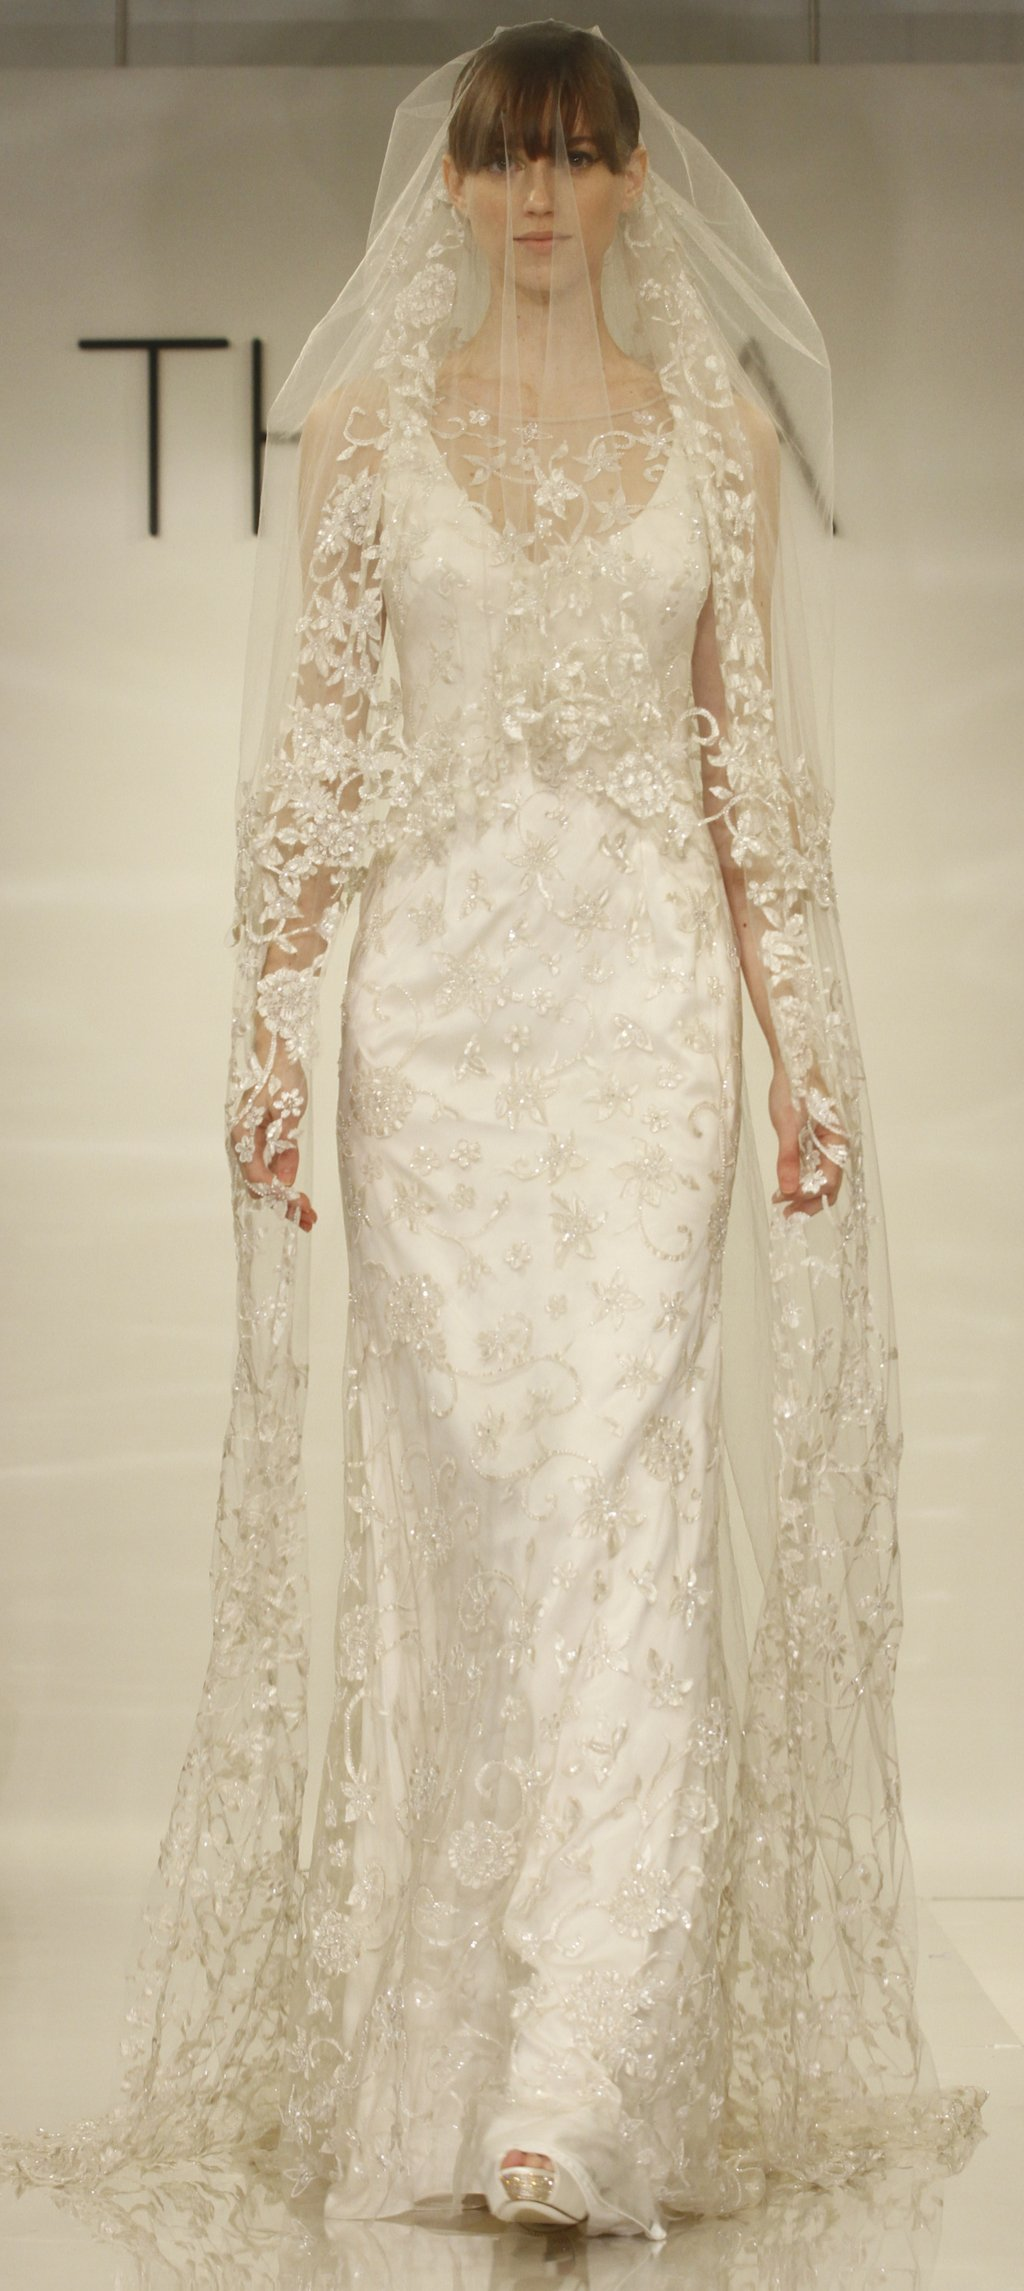 Cora-wedding-dress-by-theia-fall-2014-bridal.full